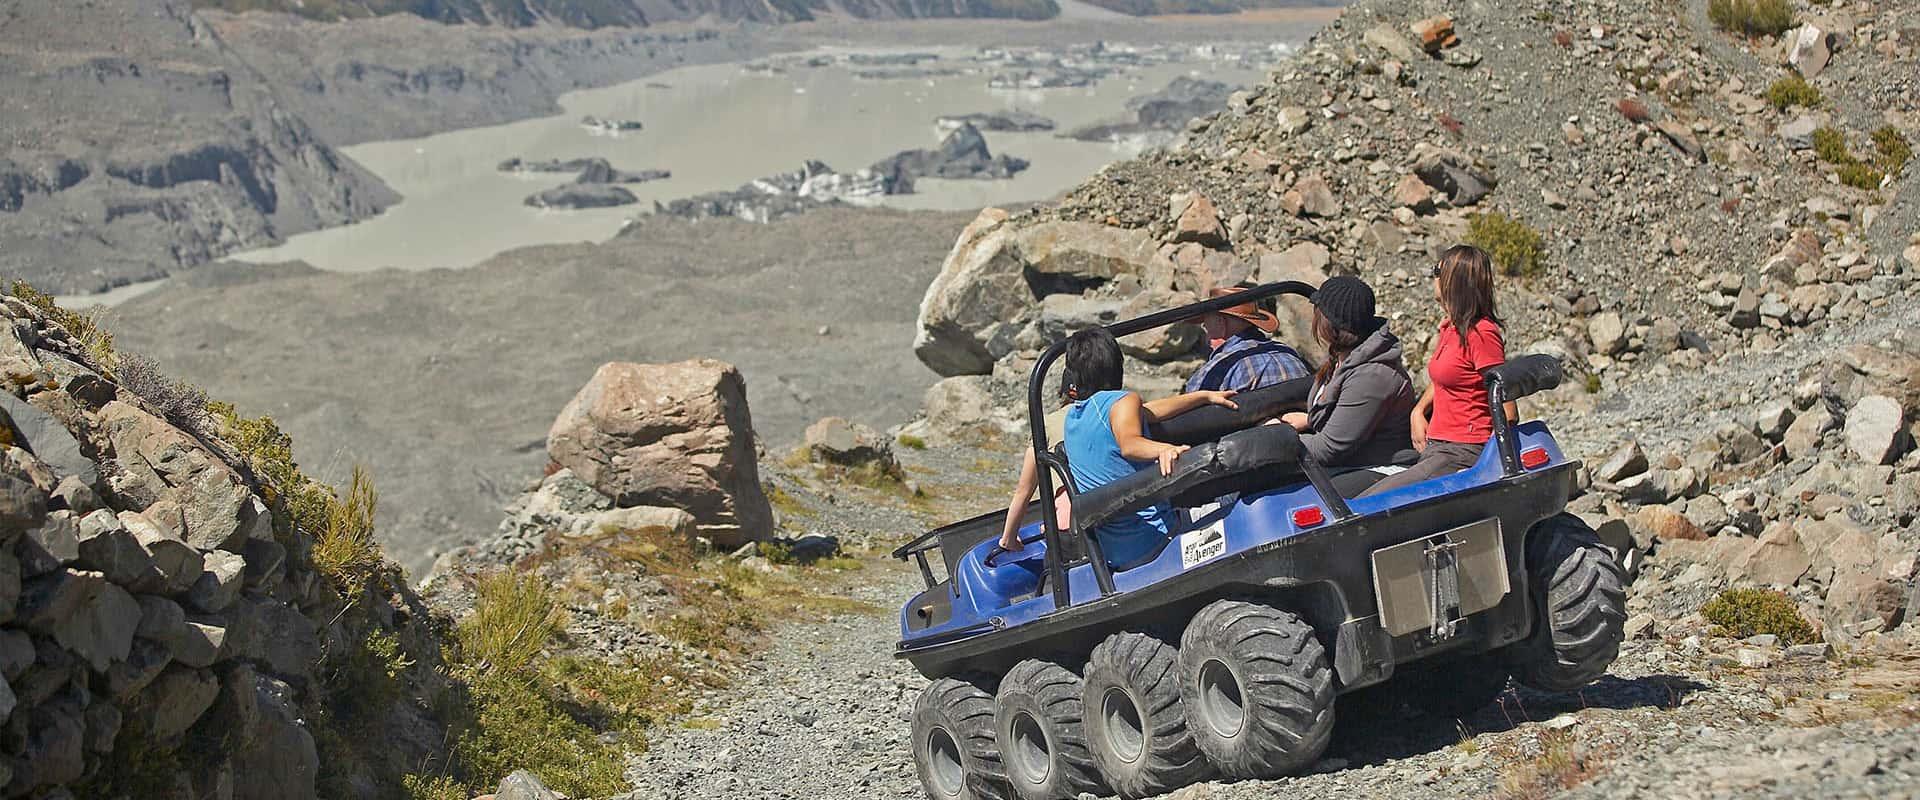 Tasman Valley 4WD vehicle tour along the Tasman Glacier and historic Ball Hut Road